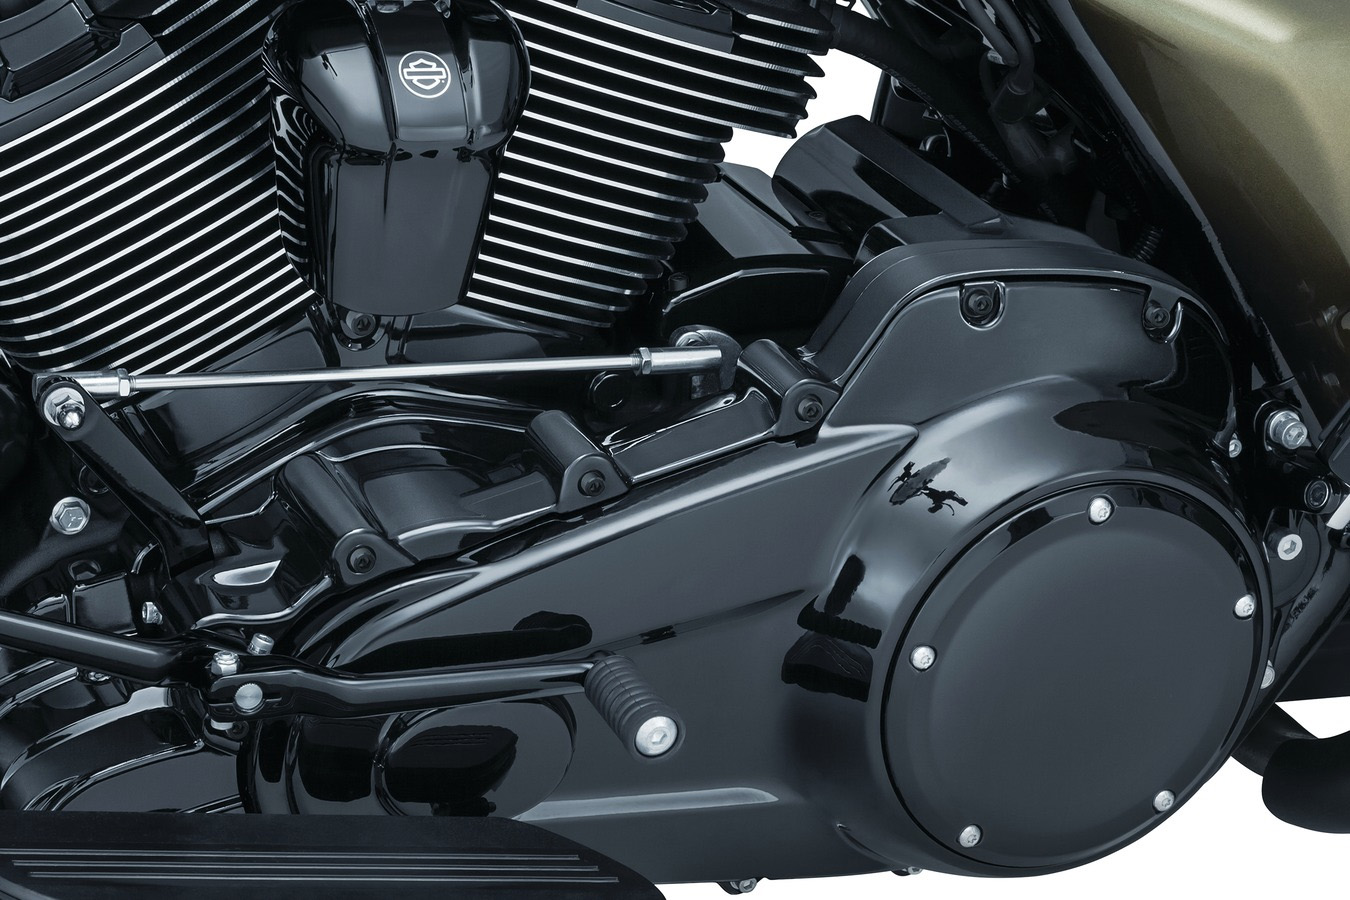 Kuryakyn Black Precision Engine Covers for Milwaukee-Eight